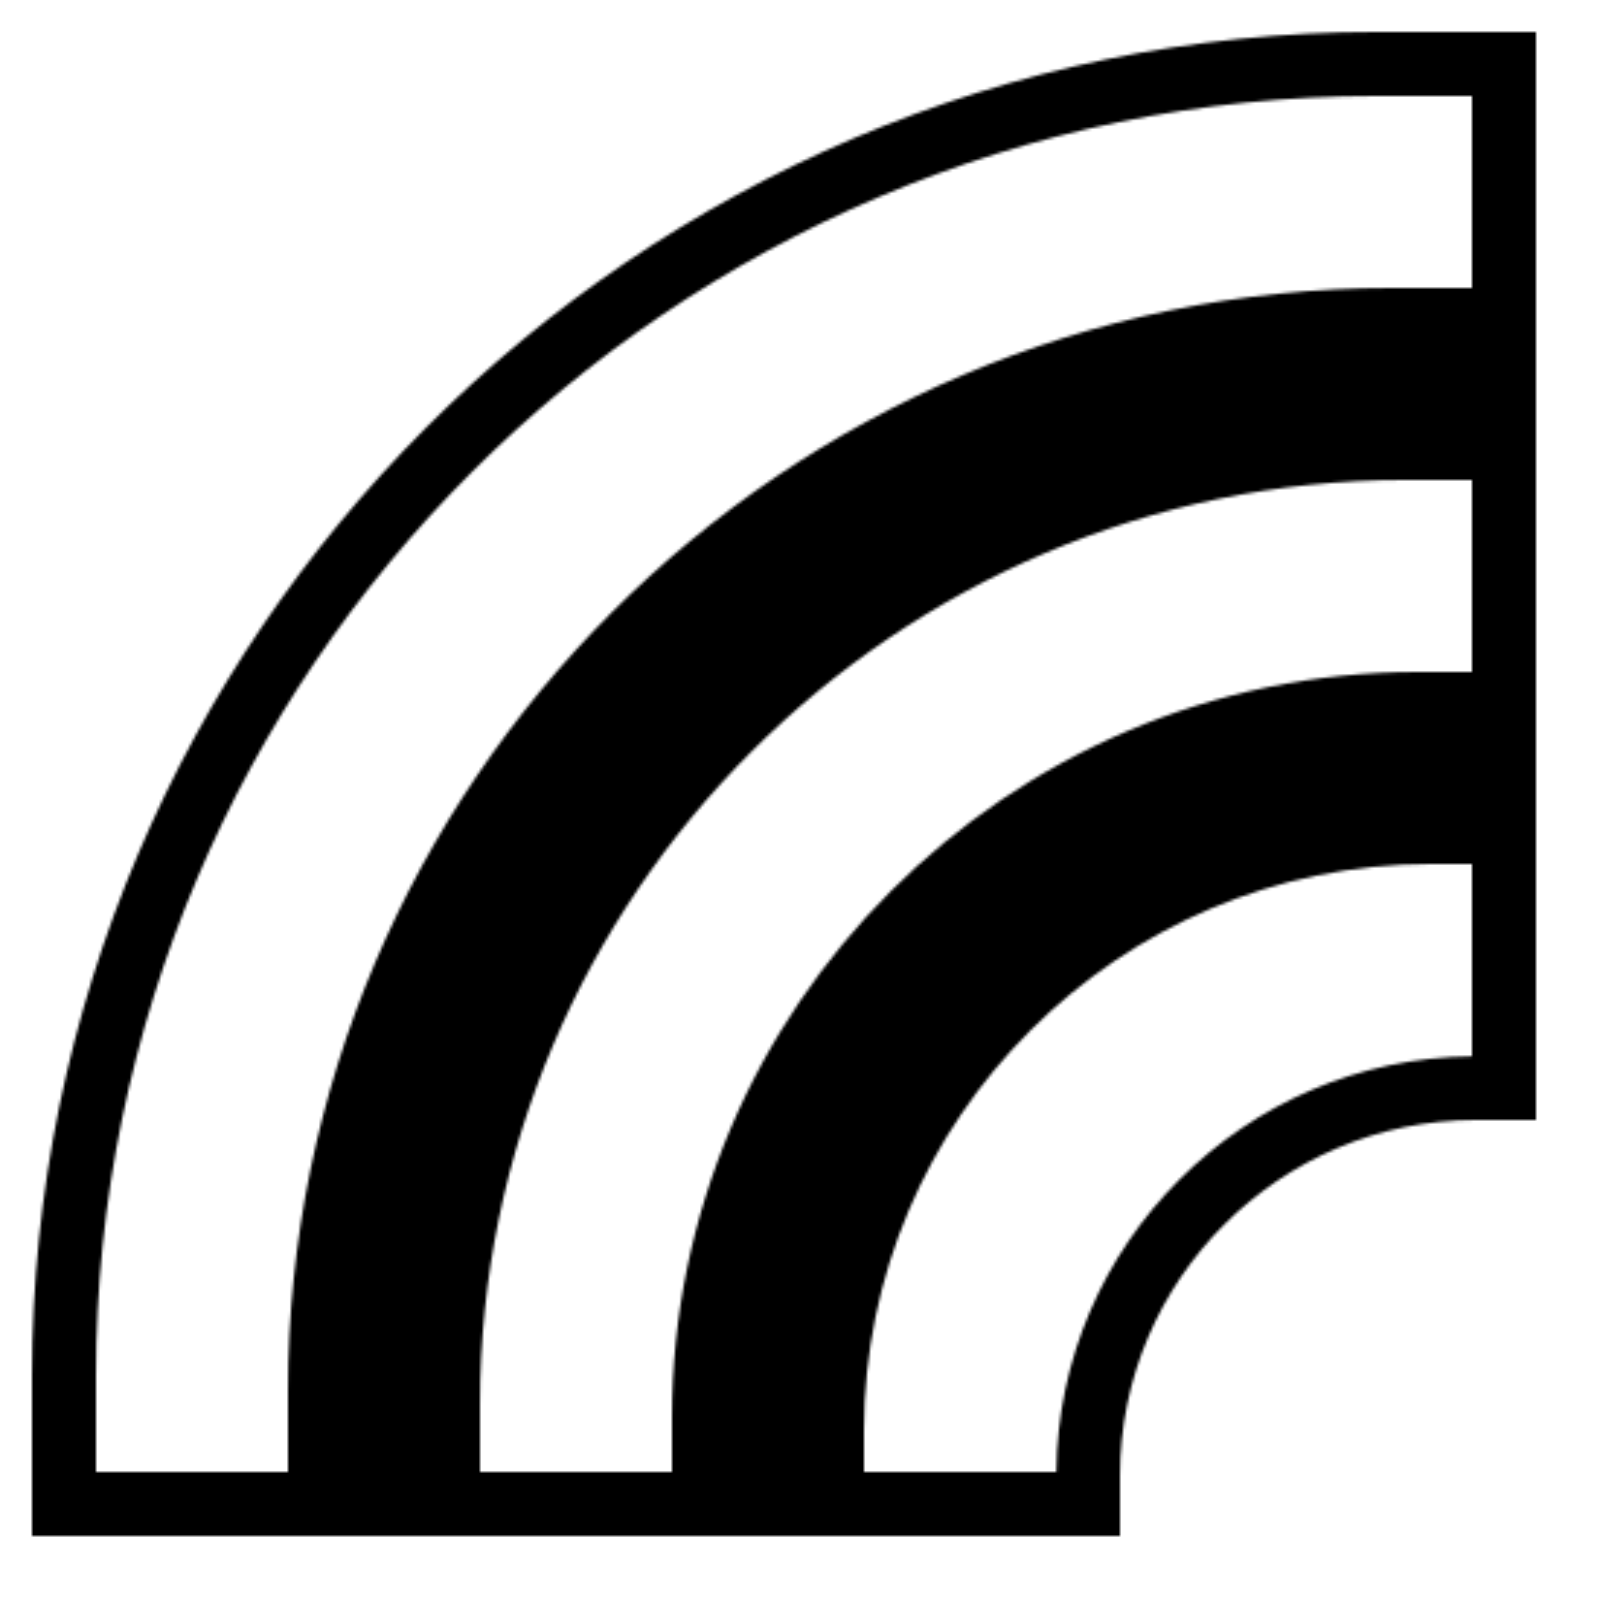 Rainbow Filled icon